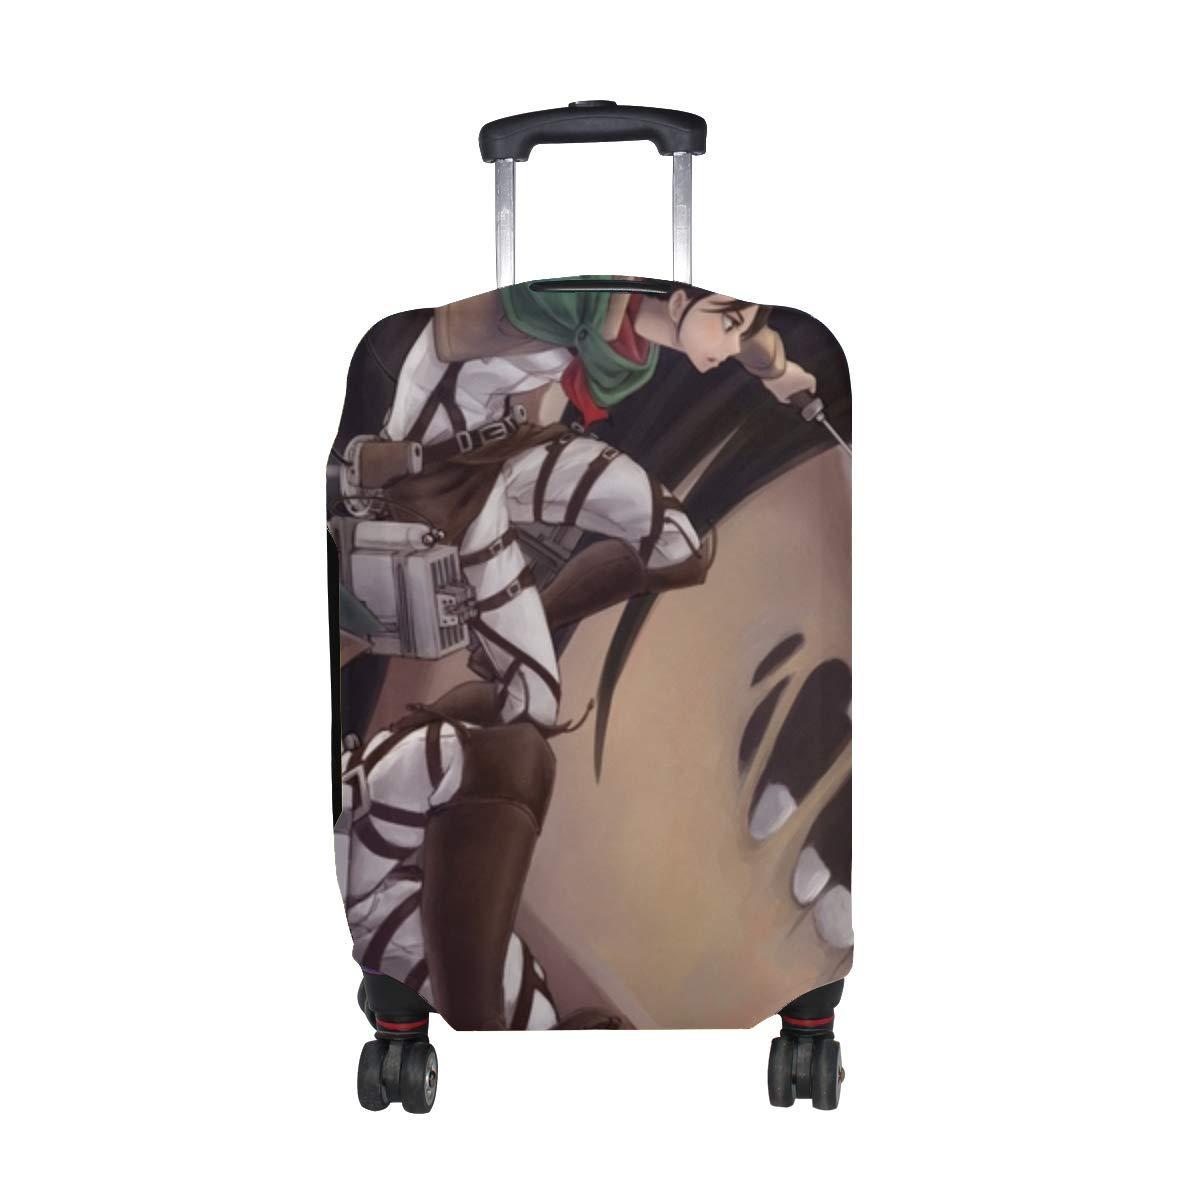 Maxm Shingeki No Kyojin Art Sora Tsu Anime Pattern Print Travel Luggage Protector Baggage Suitcase Cover Fits 18-21 Inch Luggage